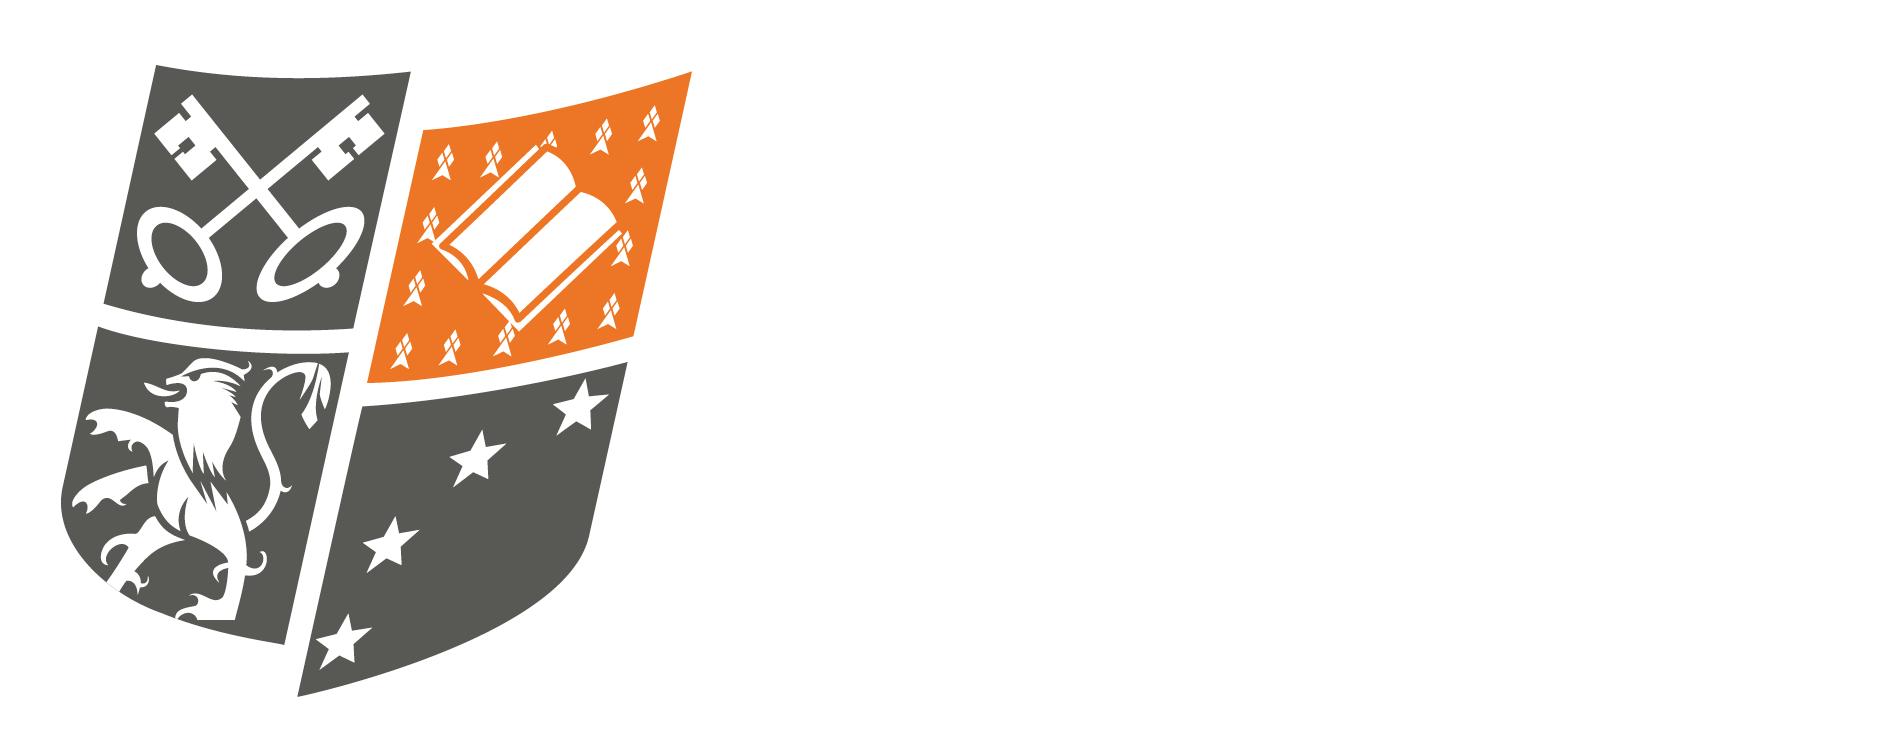 Réseau FLSH logo